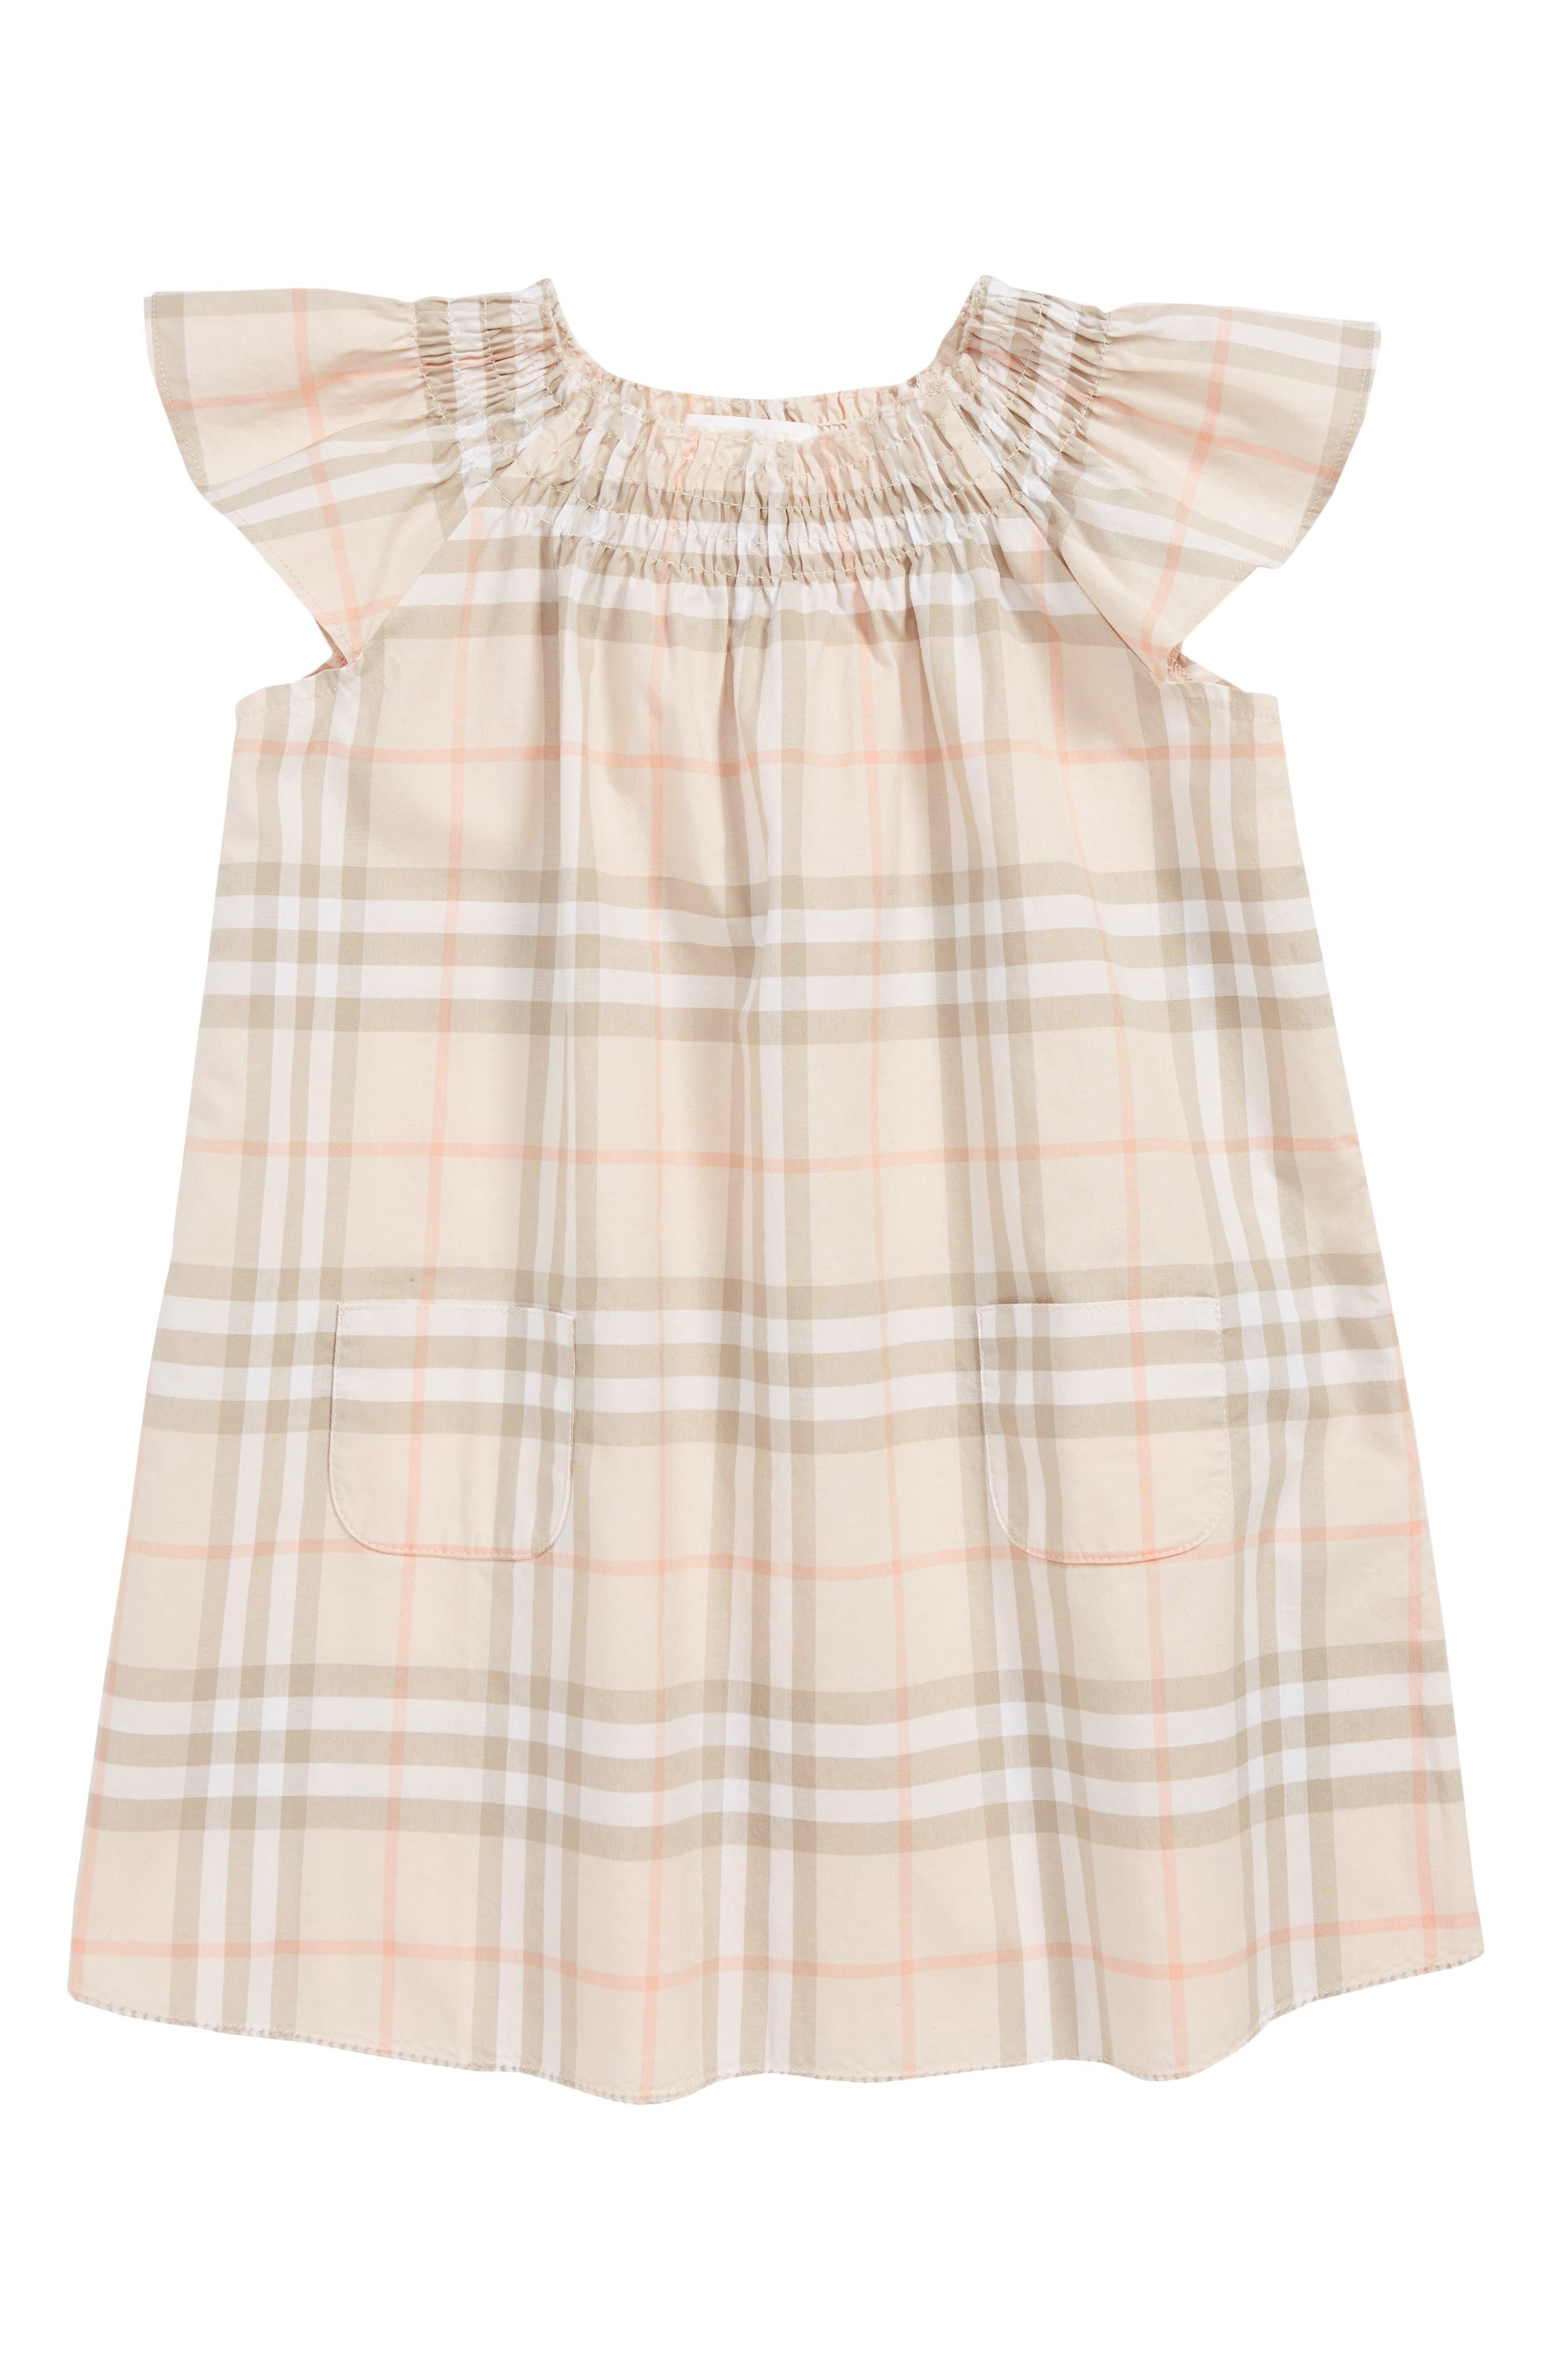 Vinya Shift Dress, Main, color, PALE PINK APRICOT IP